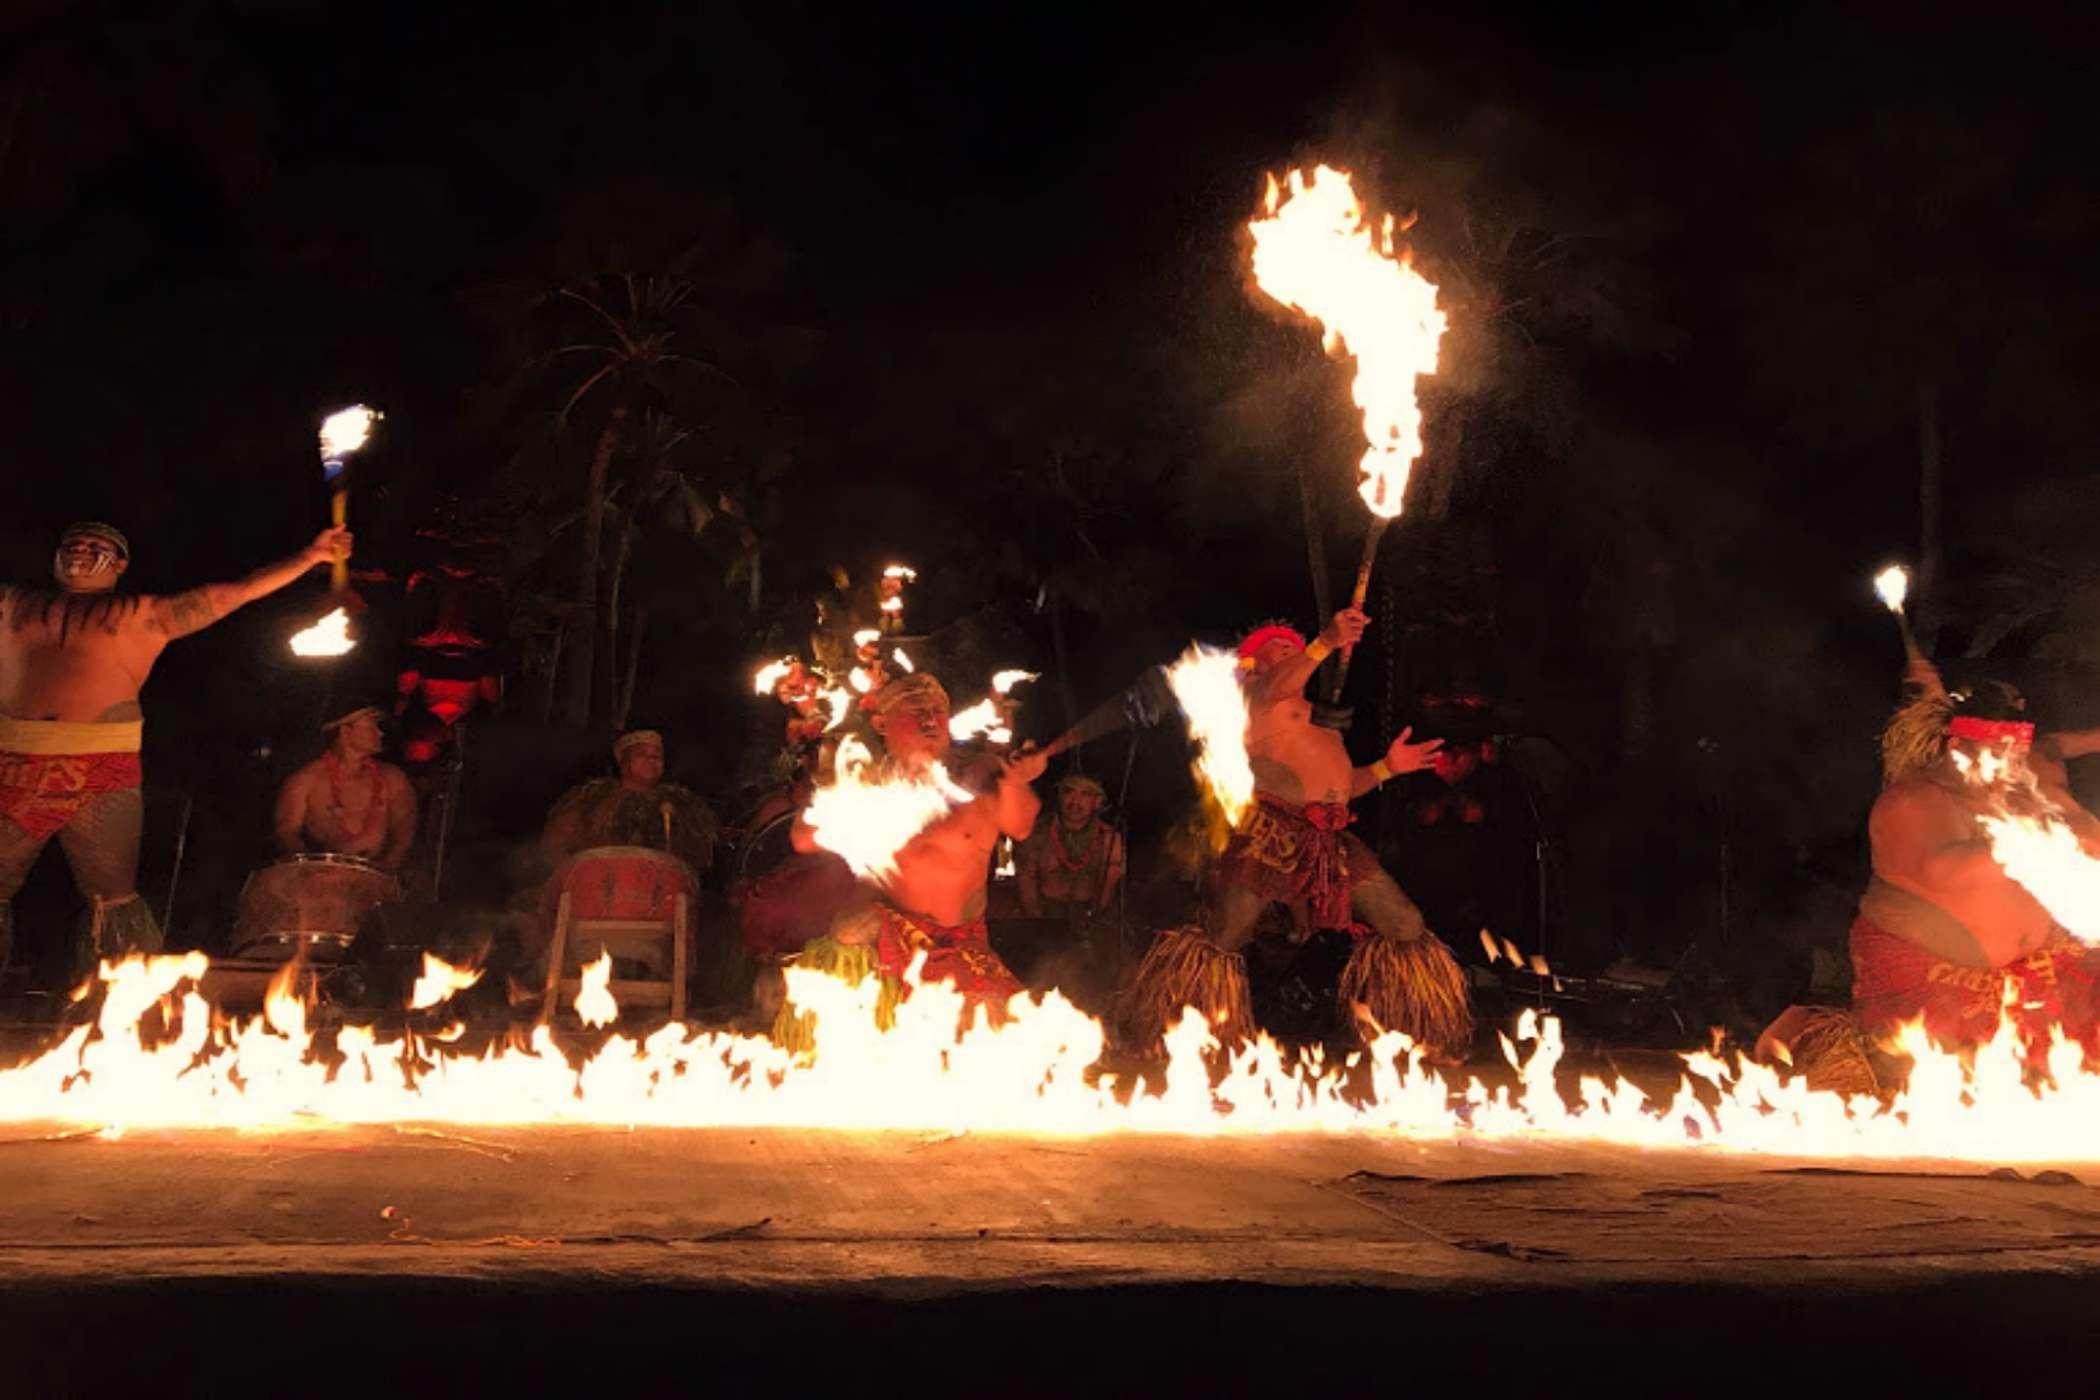 Chief's Luau on Oahu, Hawaii